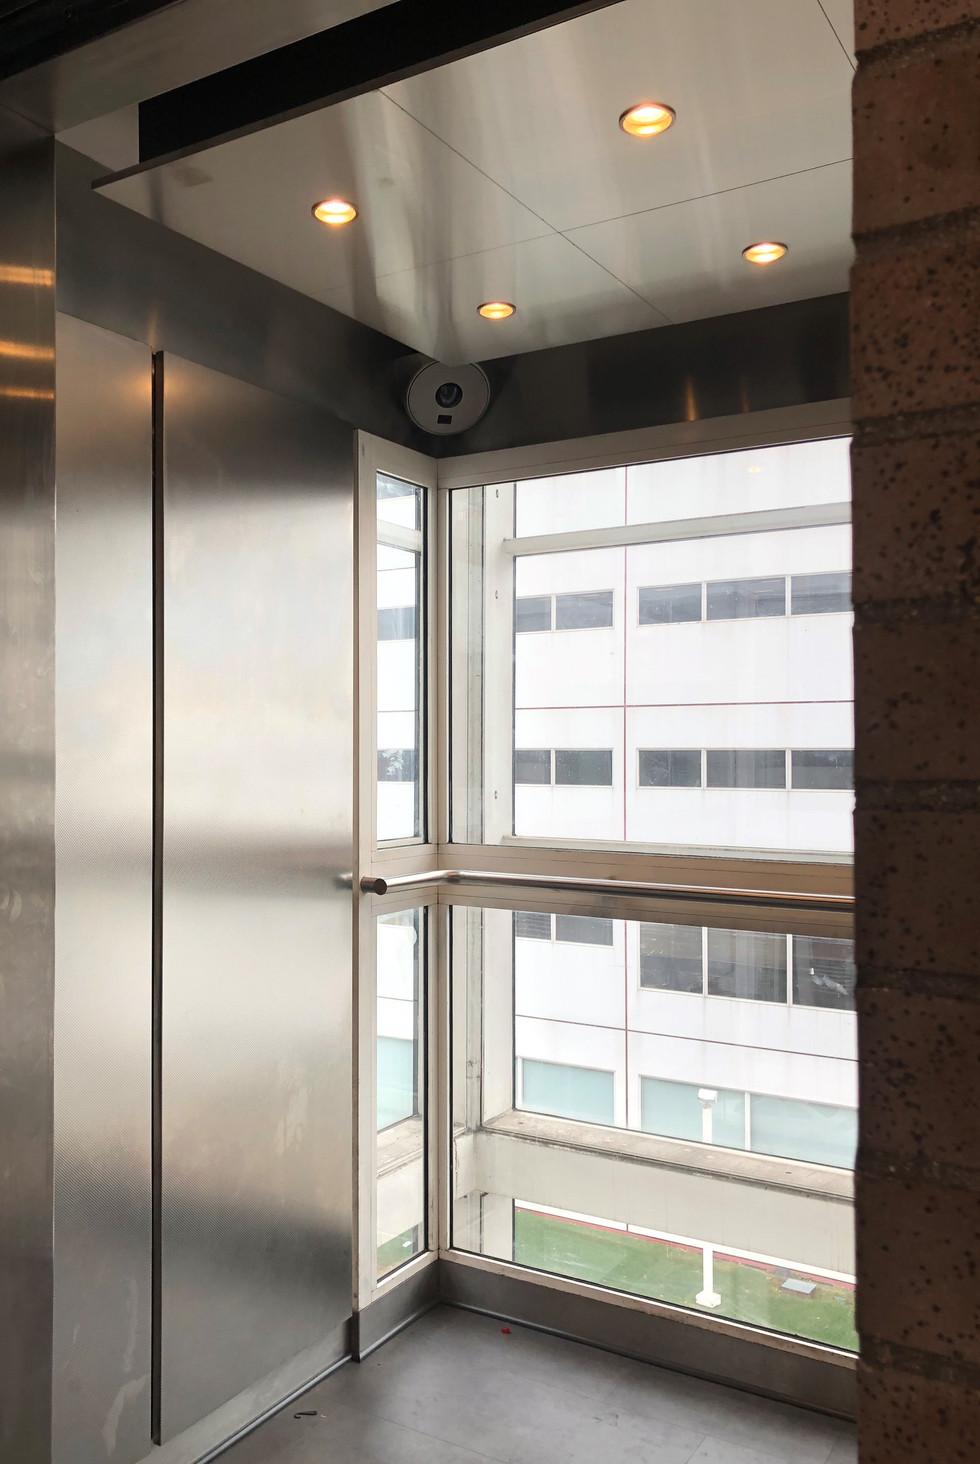 Cook County Juvi - Elevator Interior